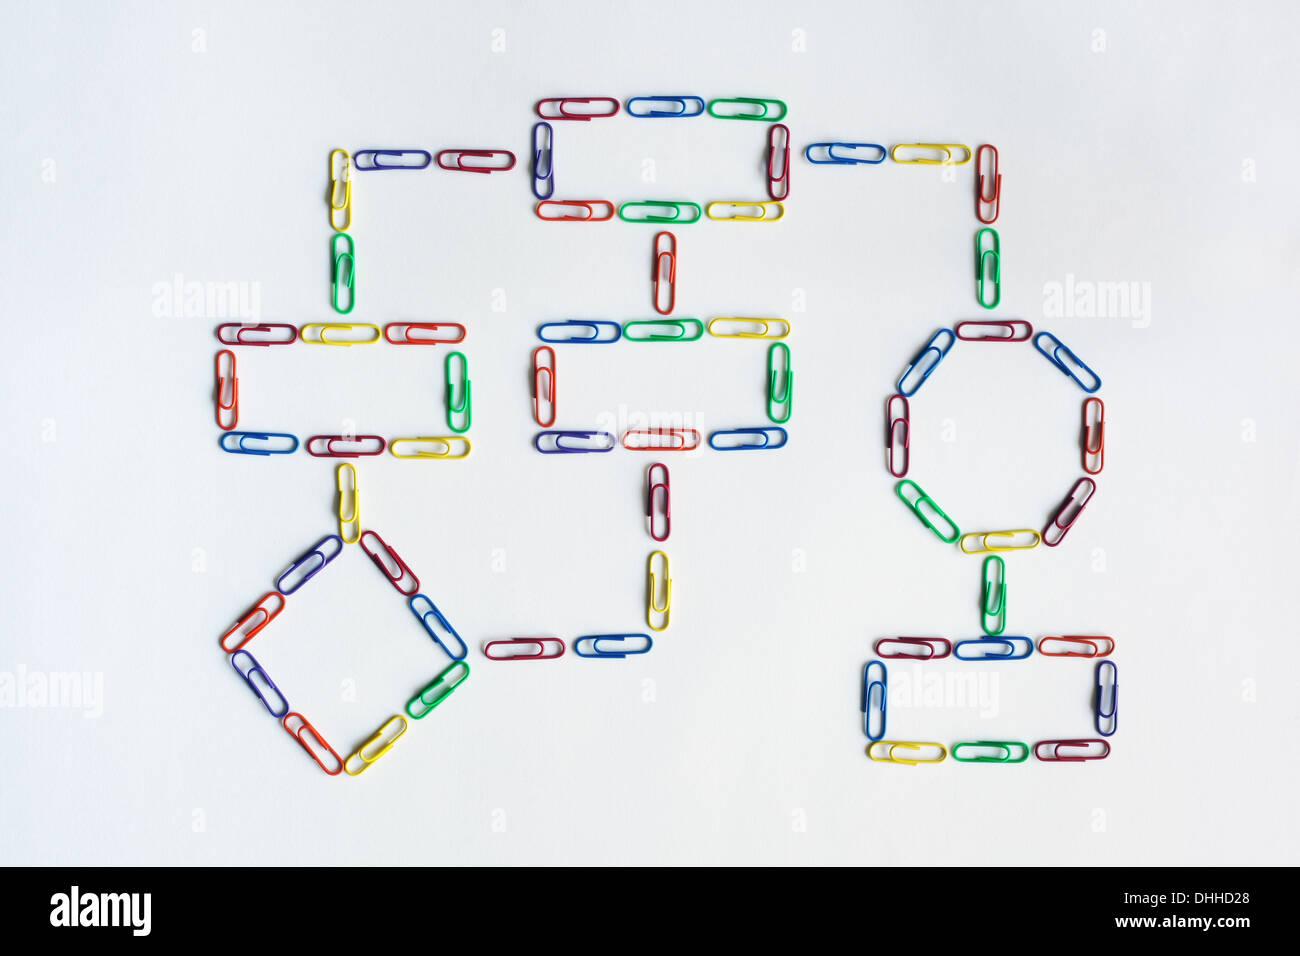 Paper clip organization chart - Stock Image